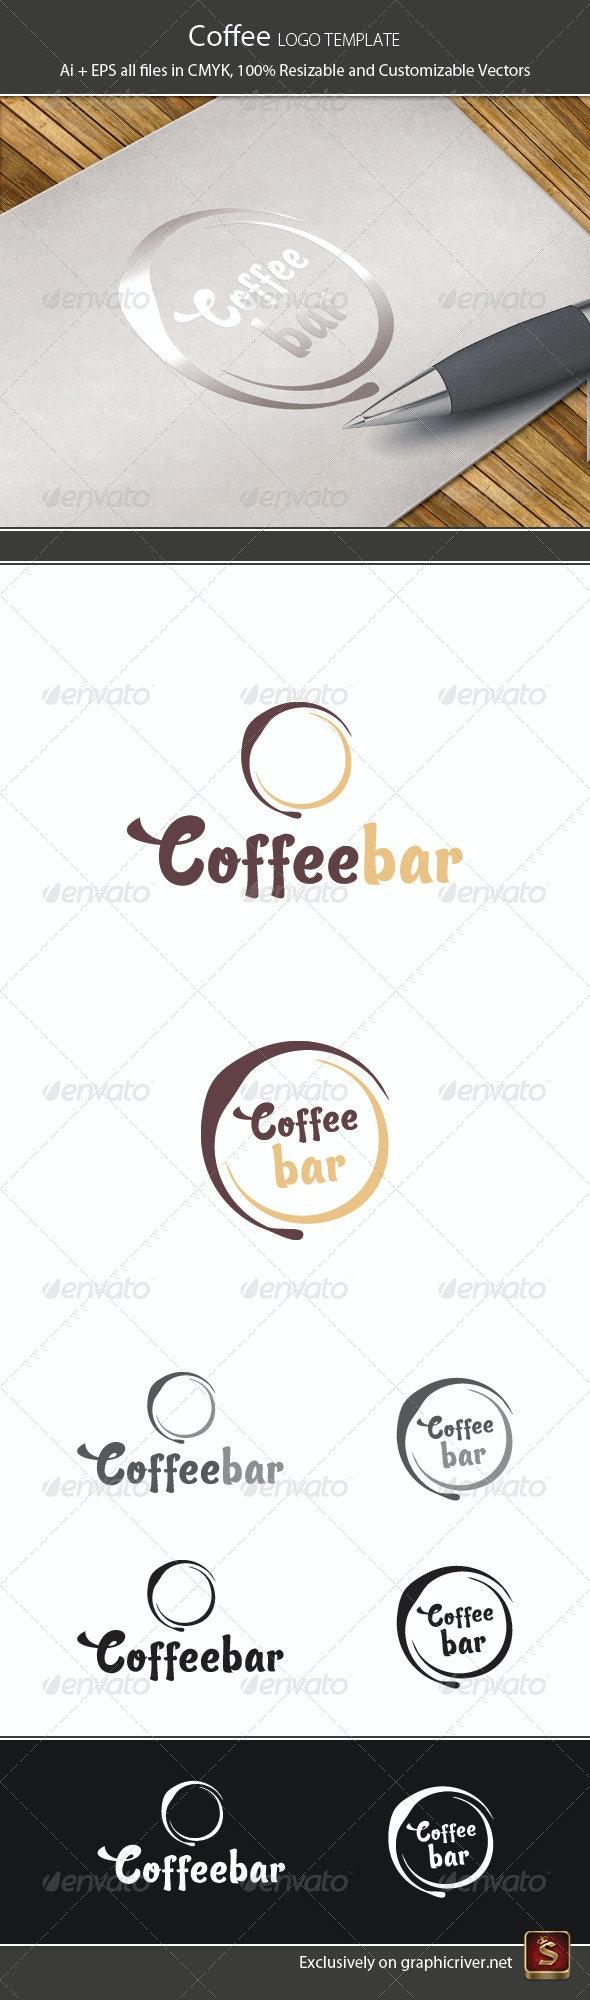 Coffee Logo Template - Vector Abstract